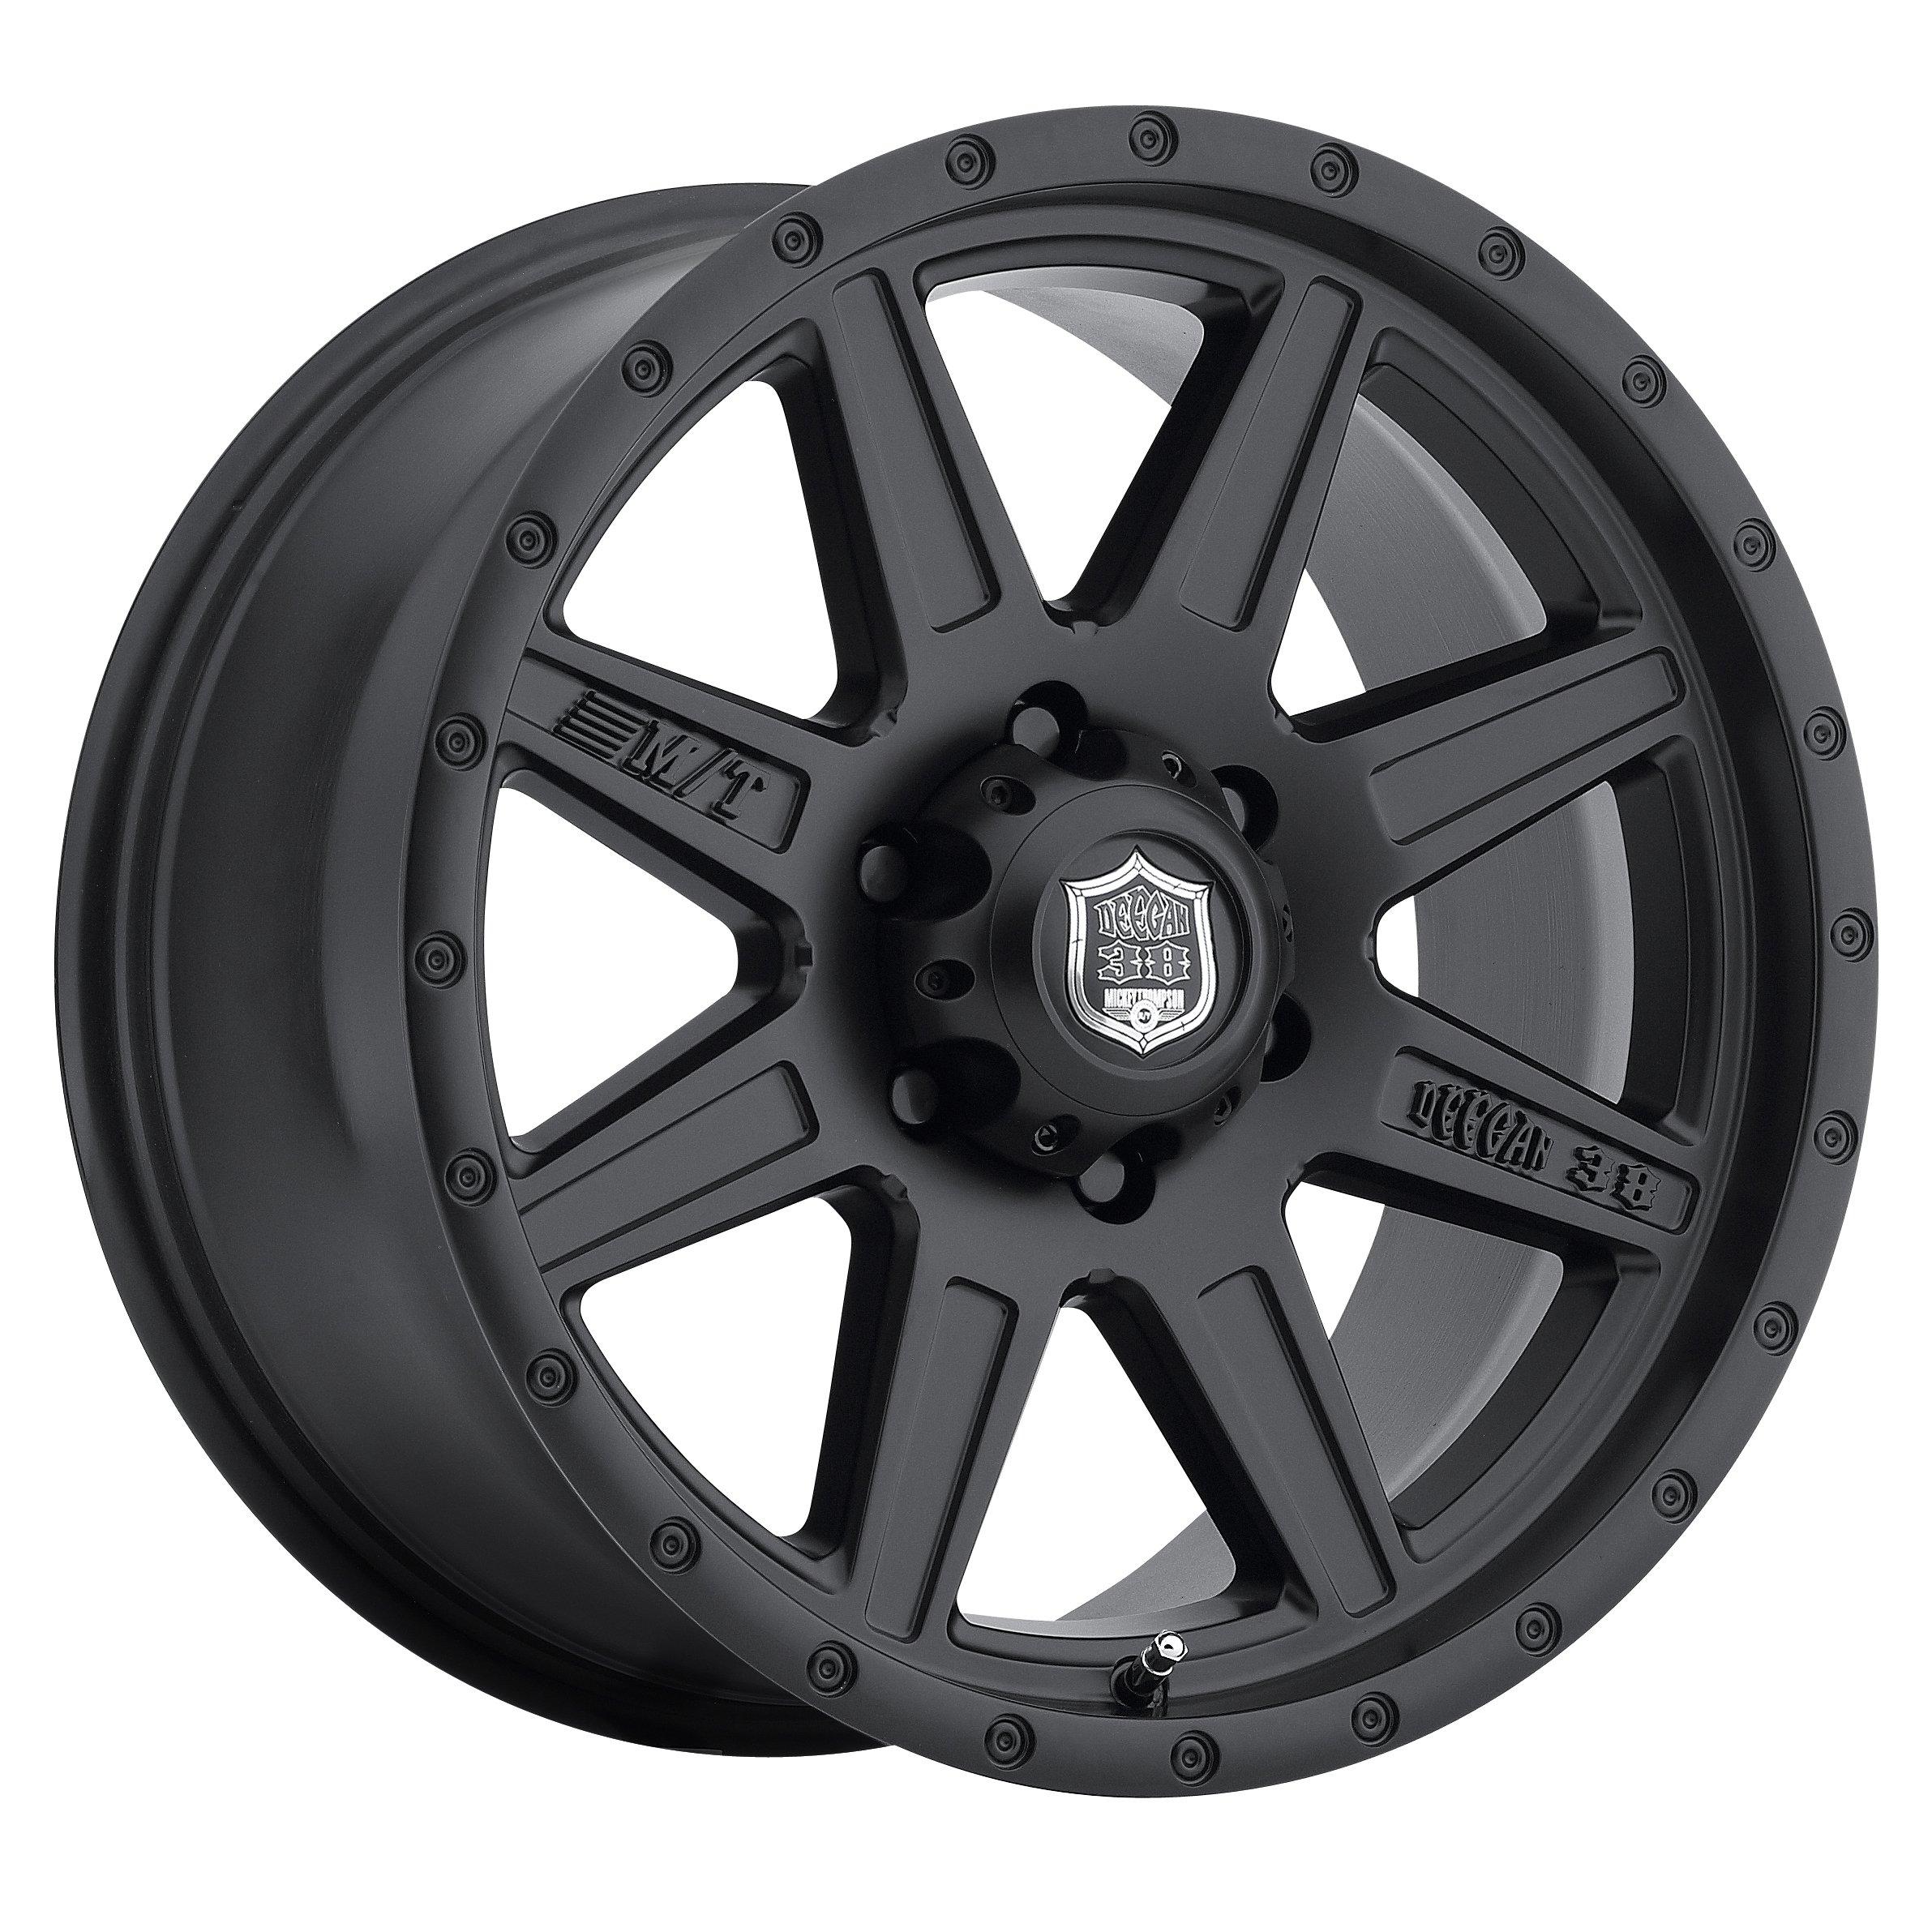 Mickey Thompson Deegan 38 PRO 2 Black Wheel with Matte Black Finish (17x9''/6x135'') 18 millimeters offset